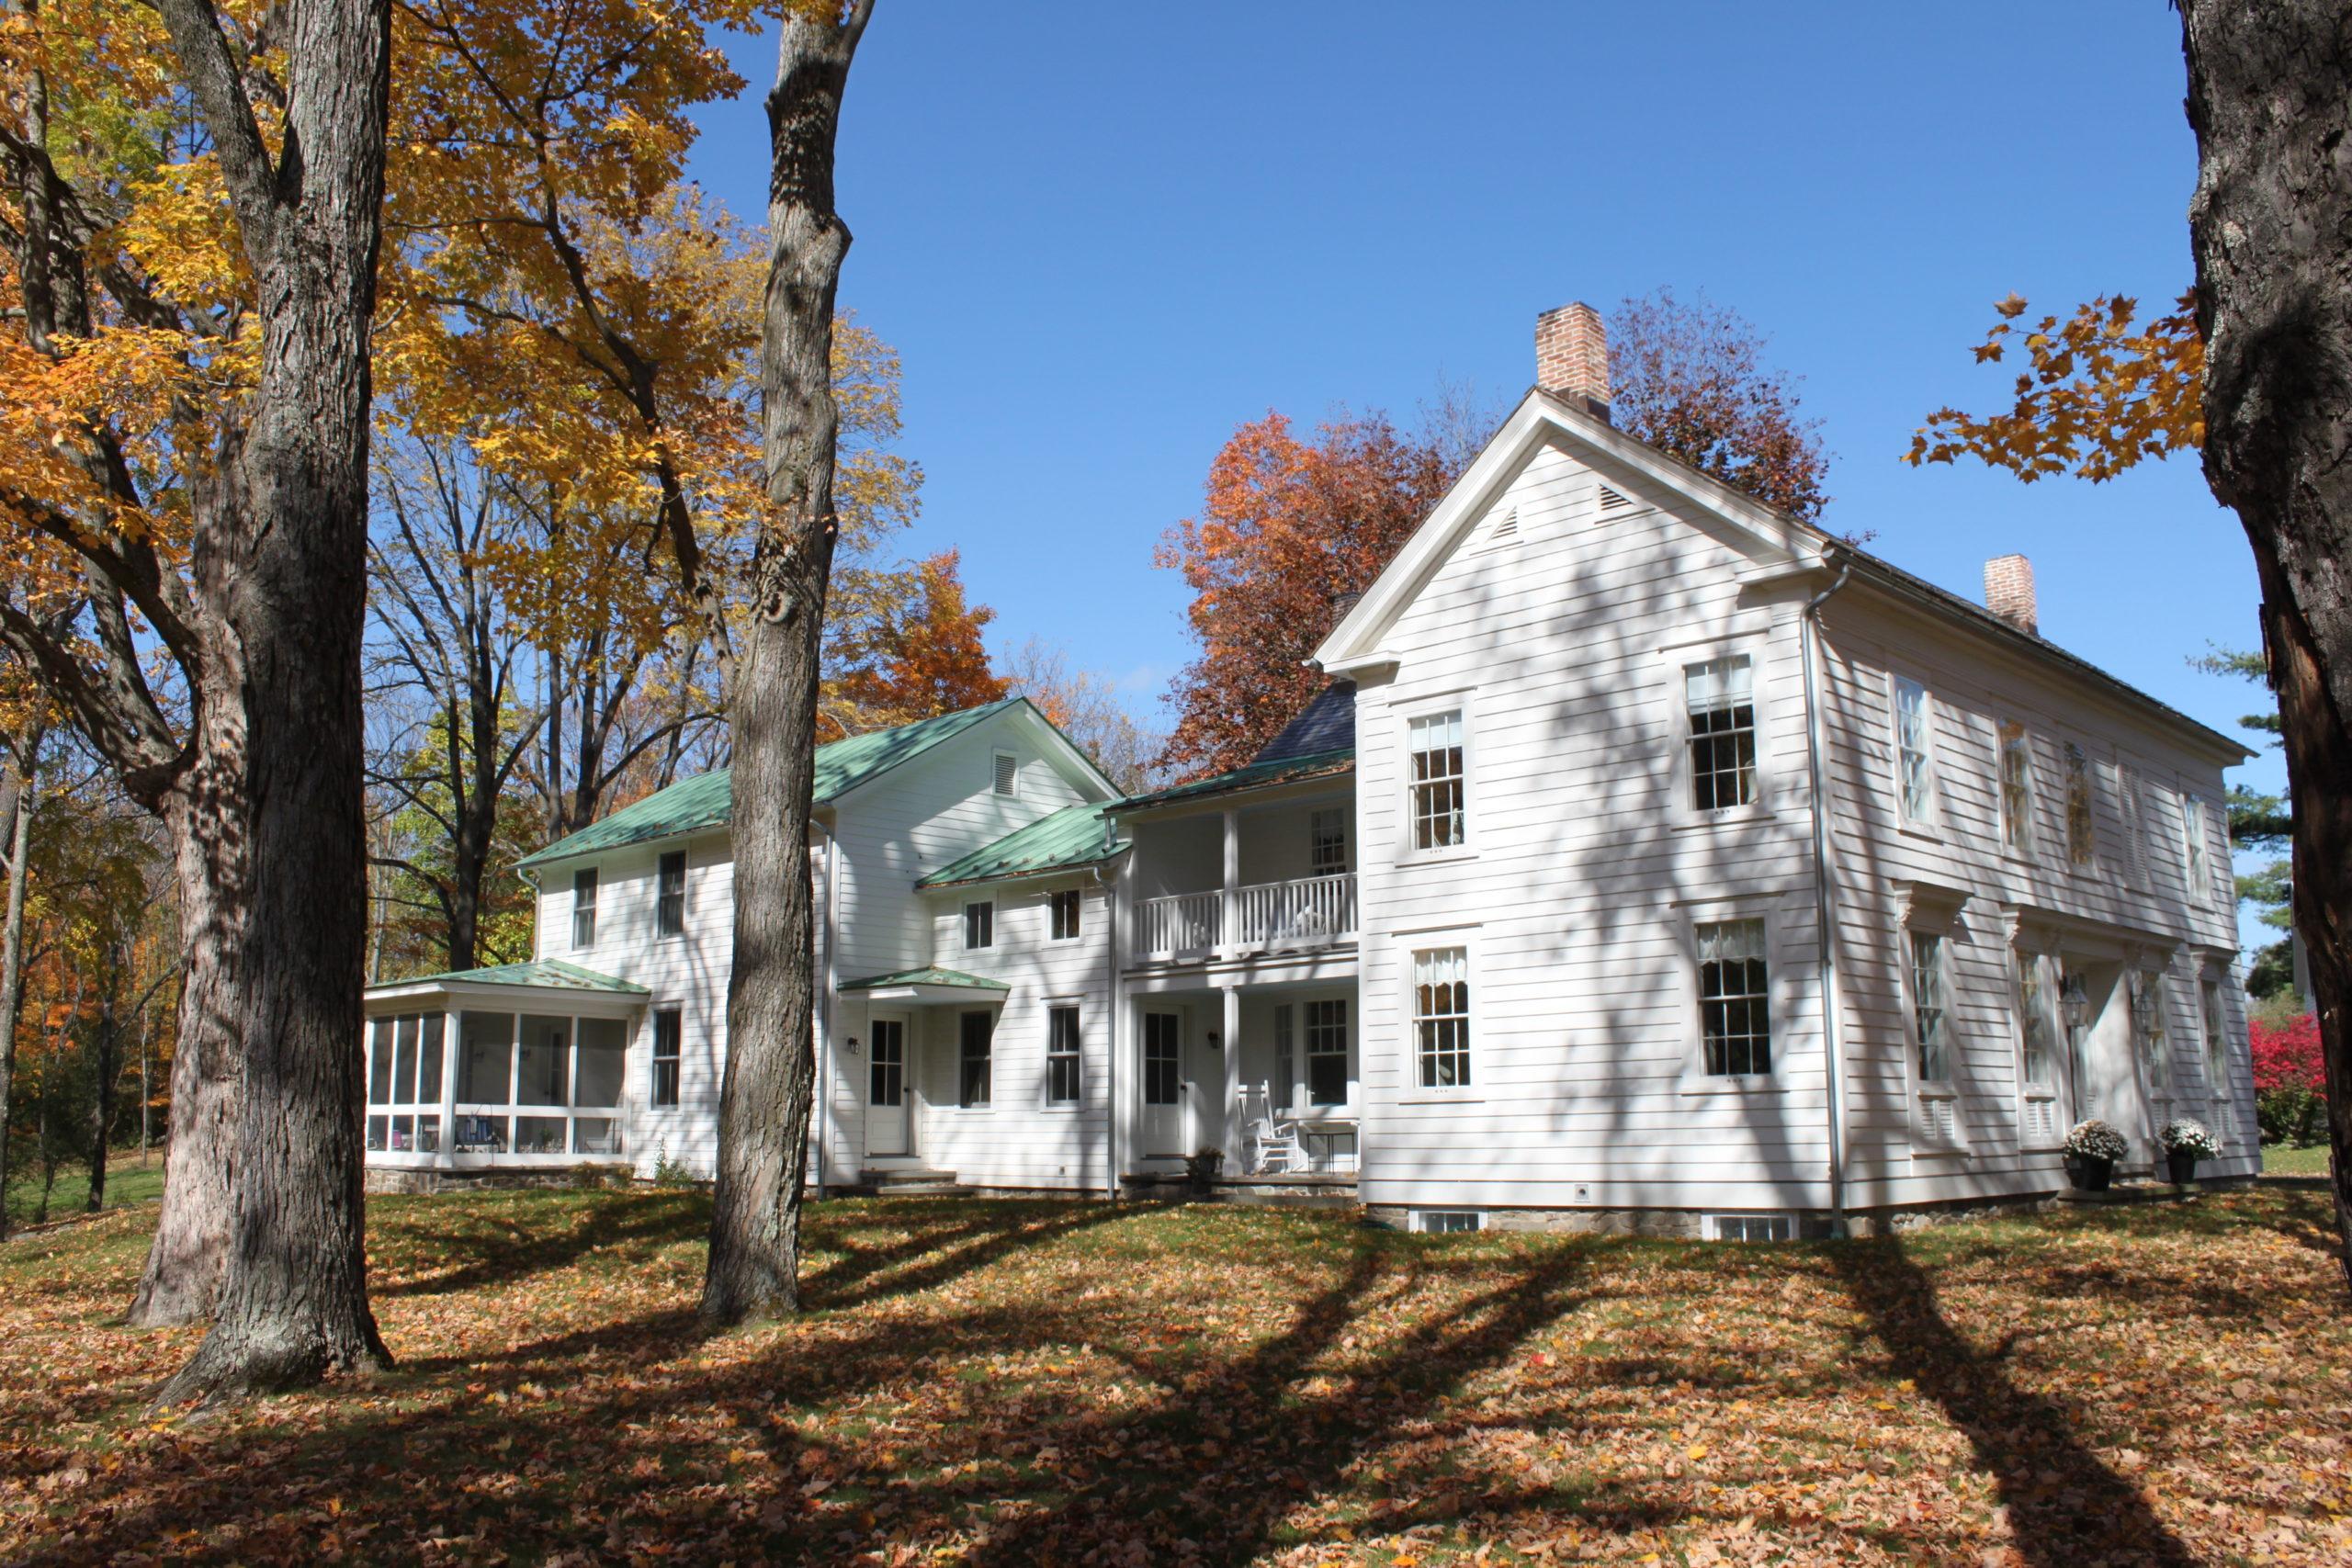 New Concord B&B - Columbia County, NY